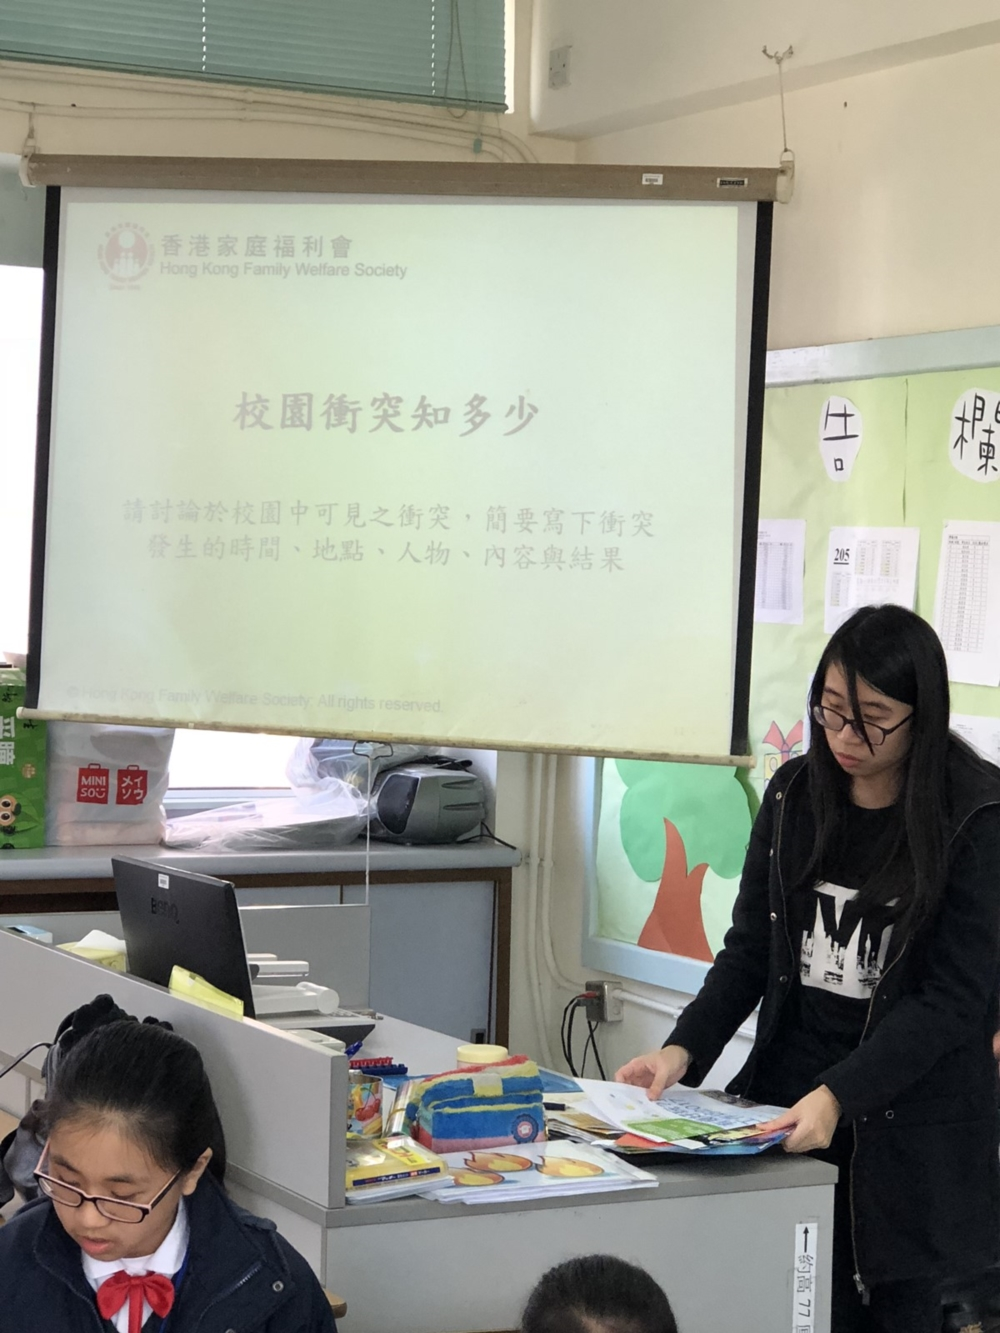 https://www.pohckwps.edu.hk/sites/default/files/34_12.jpg